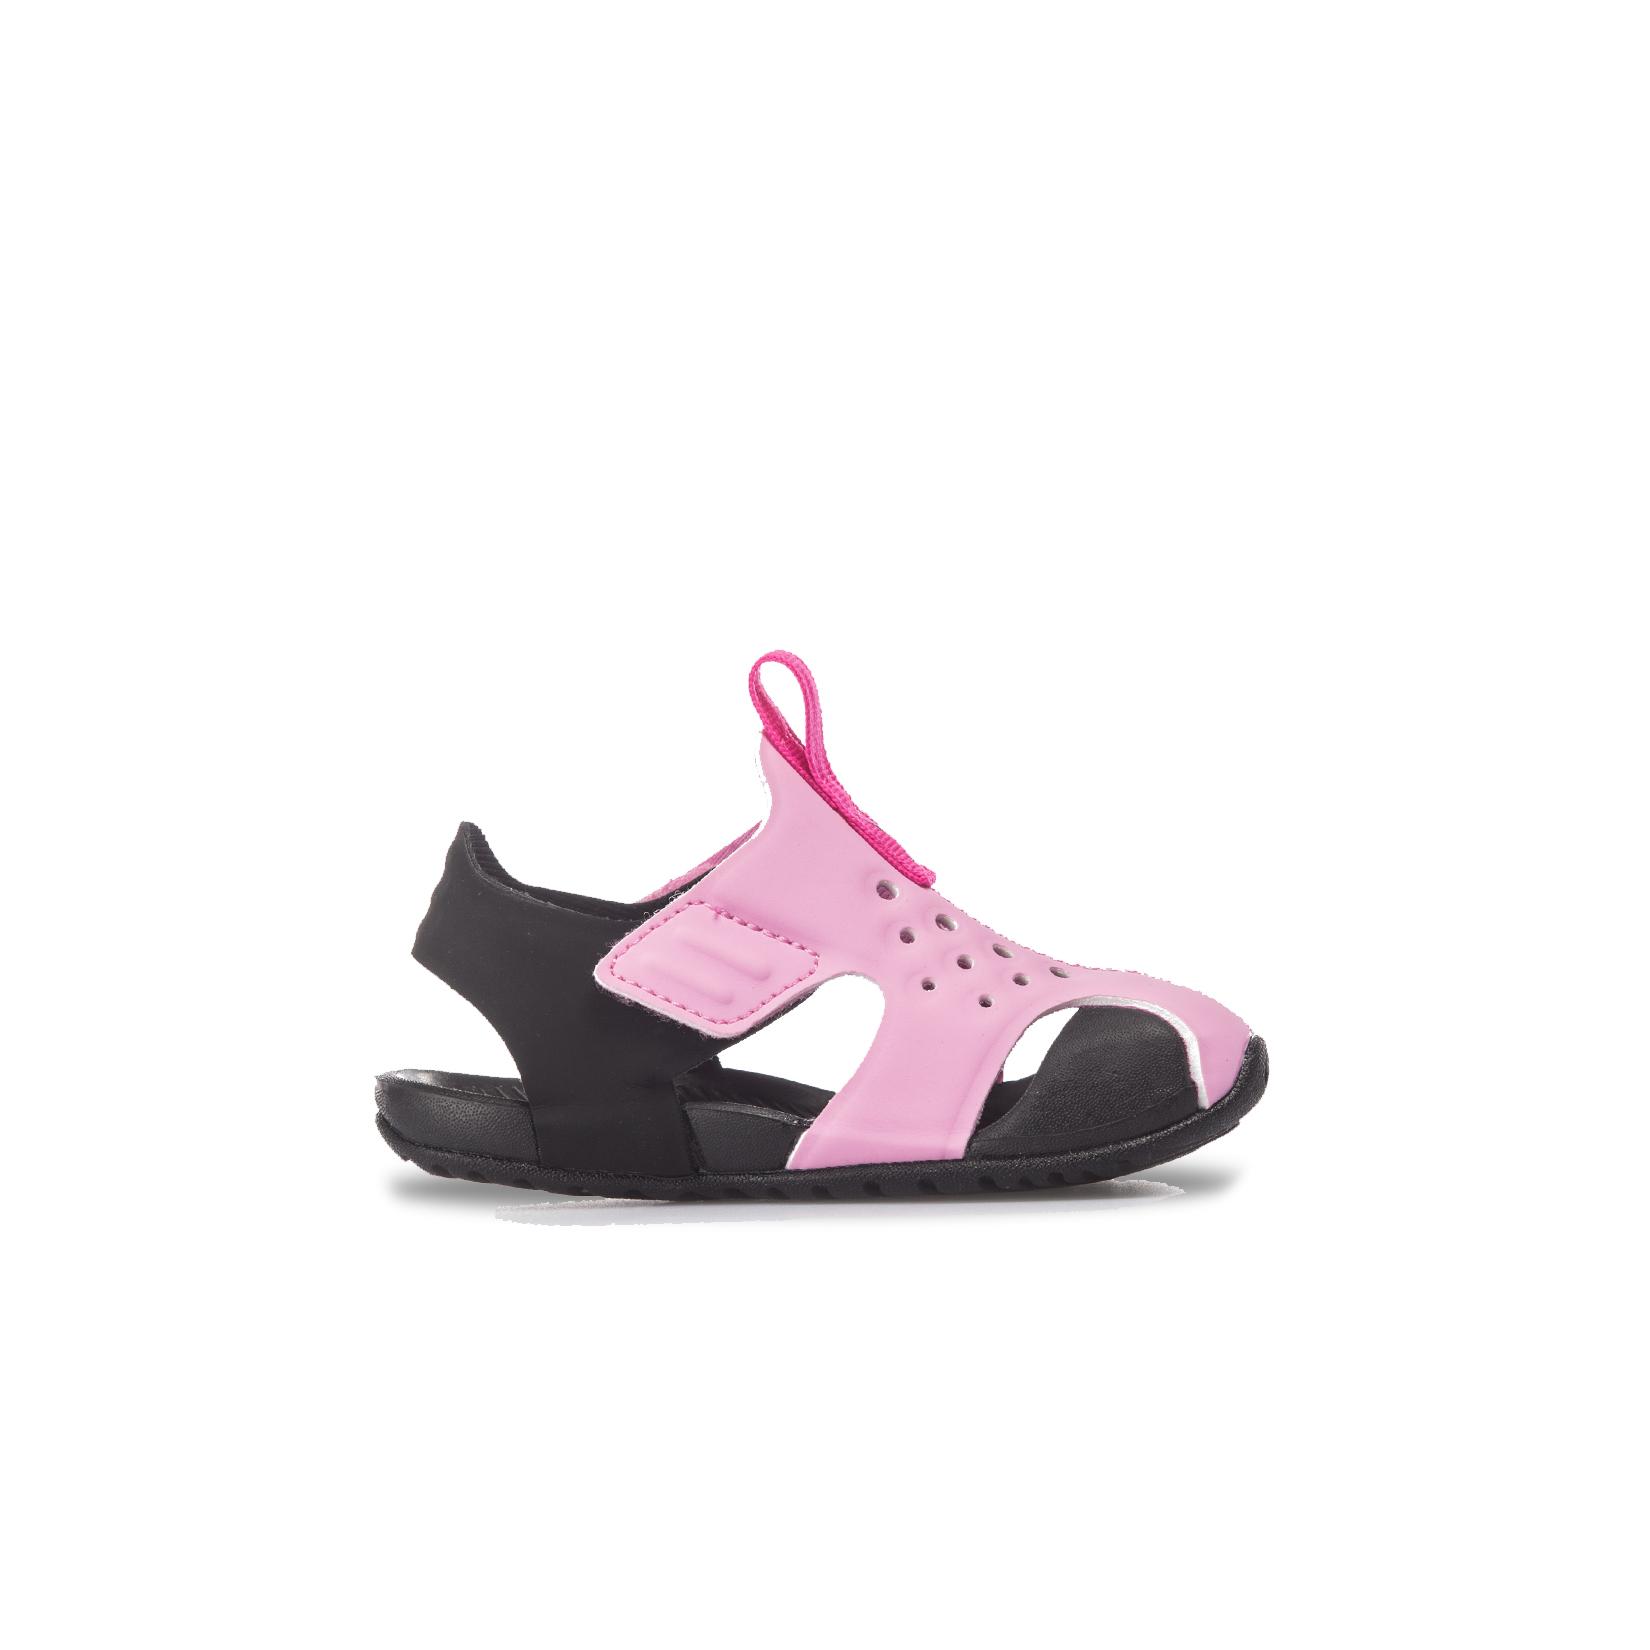 Nike Sunray Protect 2 Sandal Pink - Black